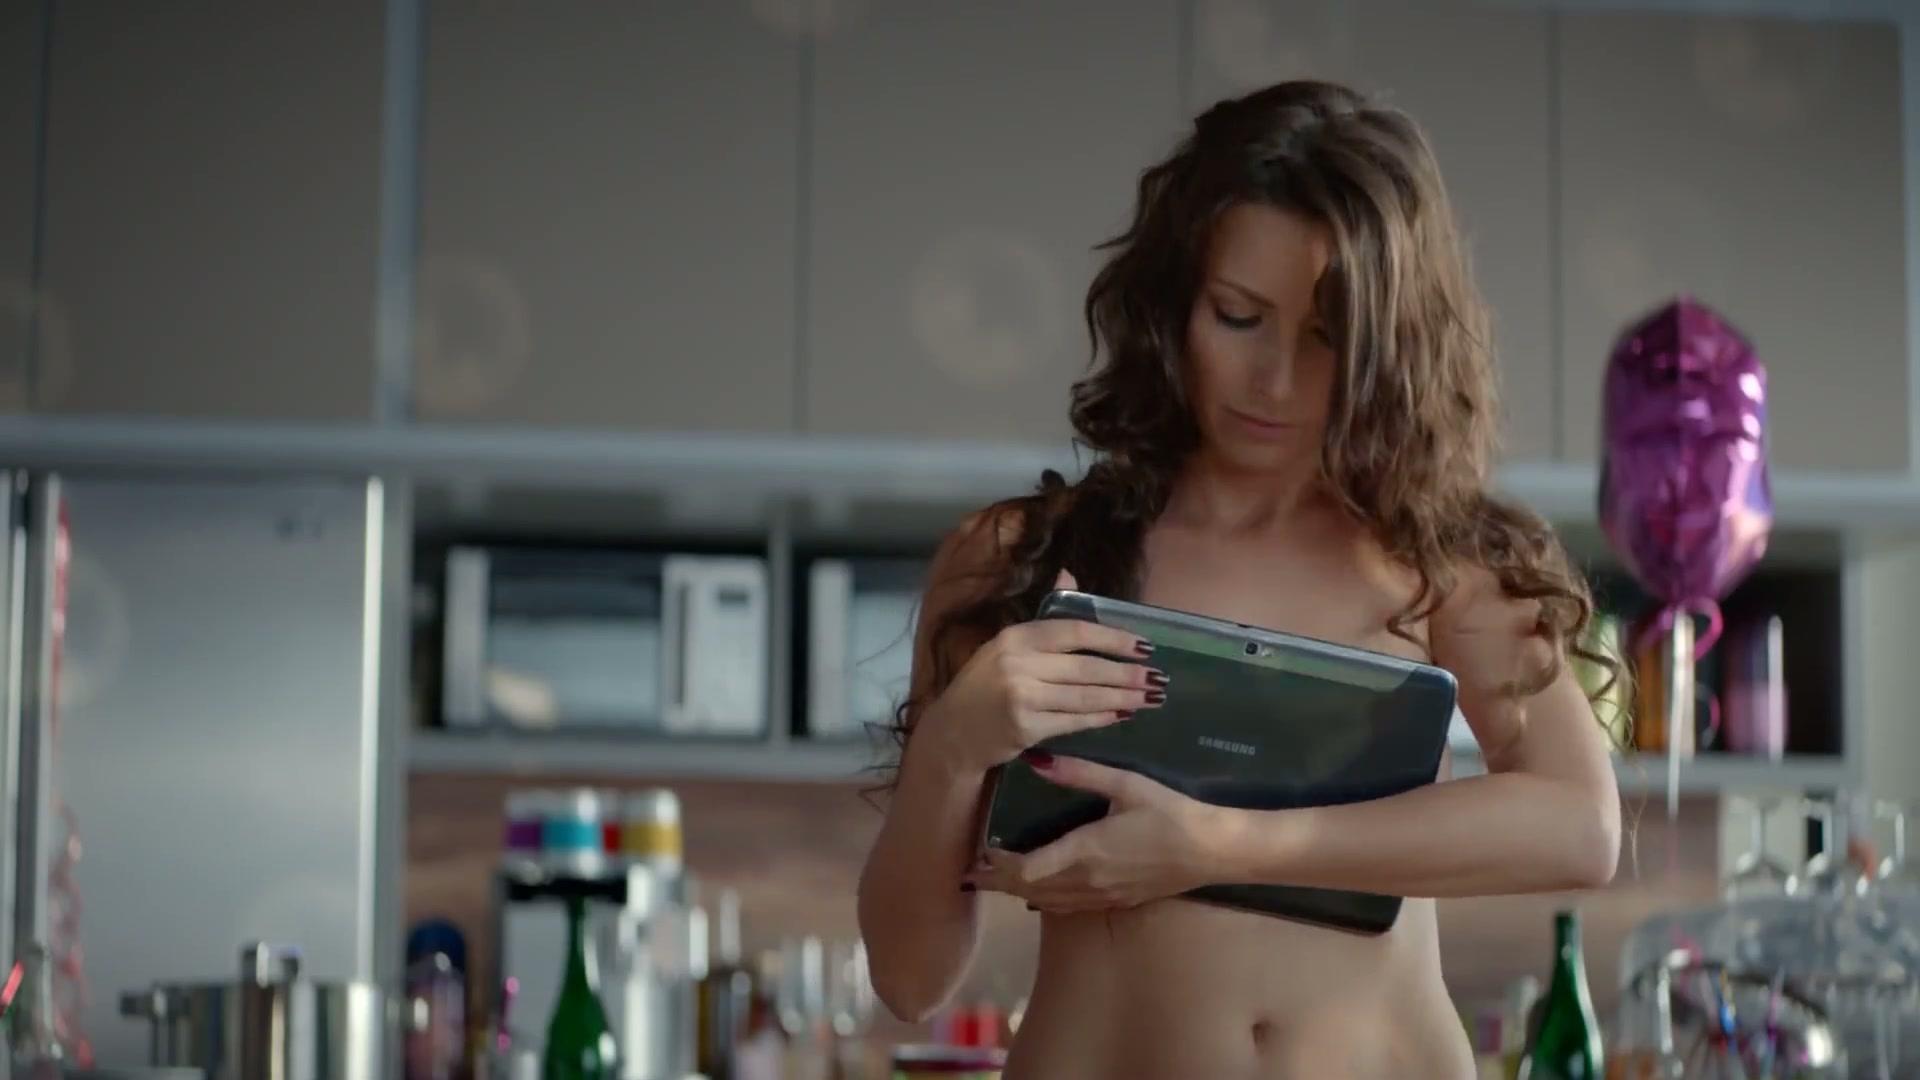 Jennifer connelly hair nudeorgy anal lesbian scene requiem